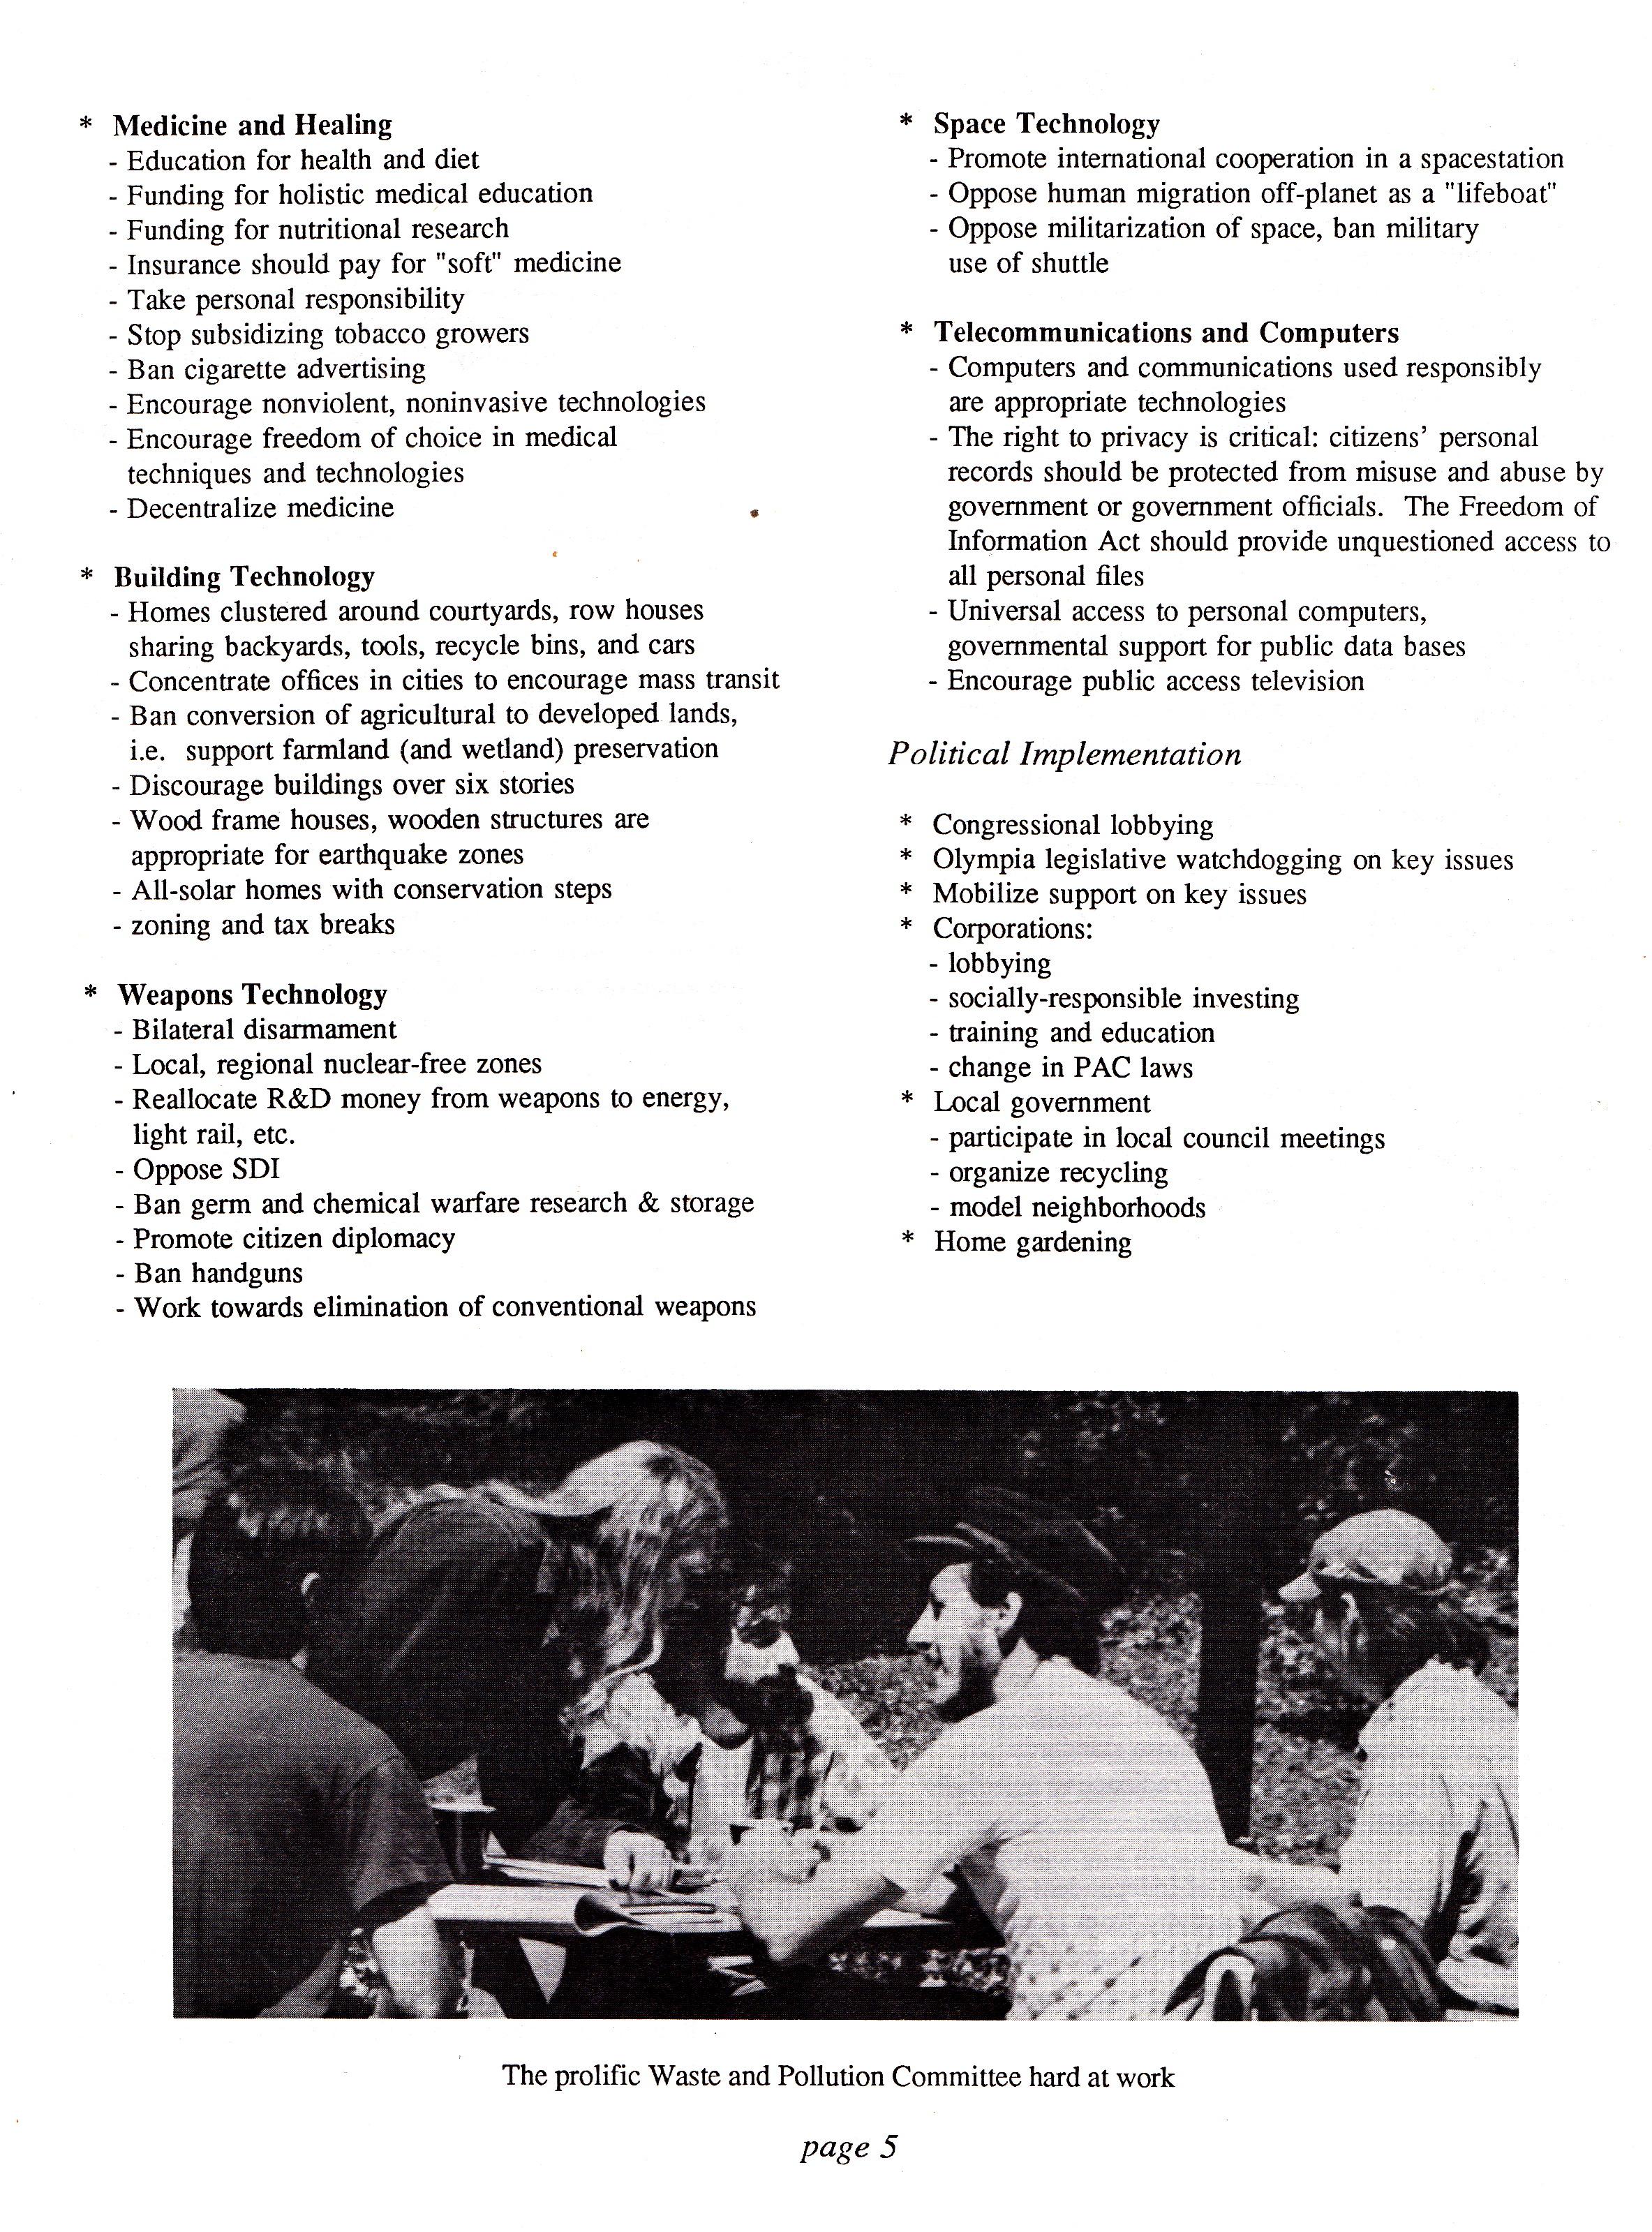 Cascadia Bioregional Congress 1986 Proceedings_0005.jpg